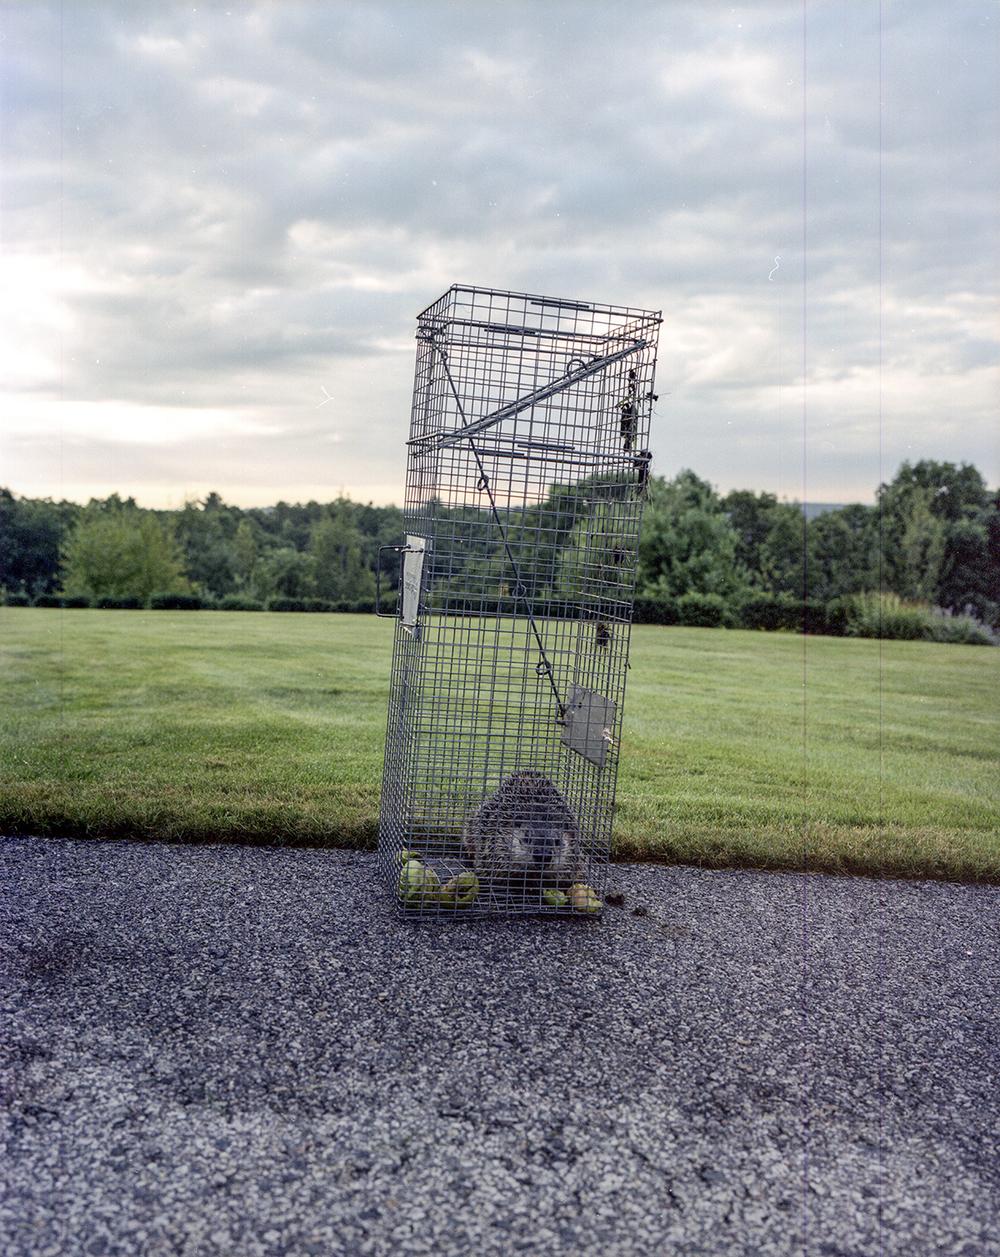 caught-rodent.jpg